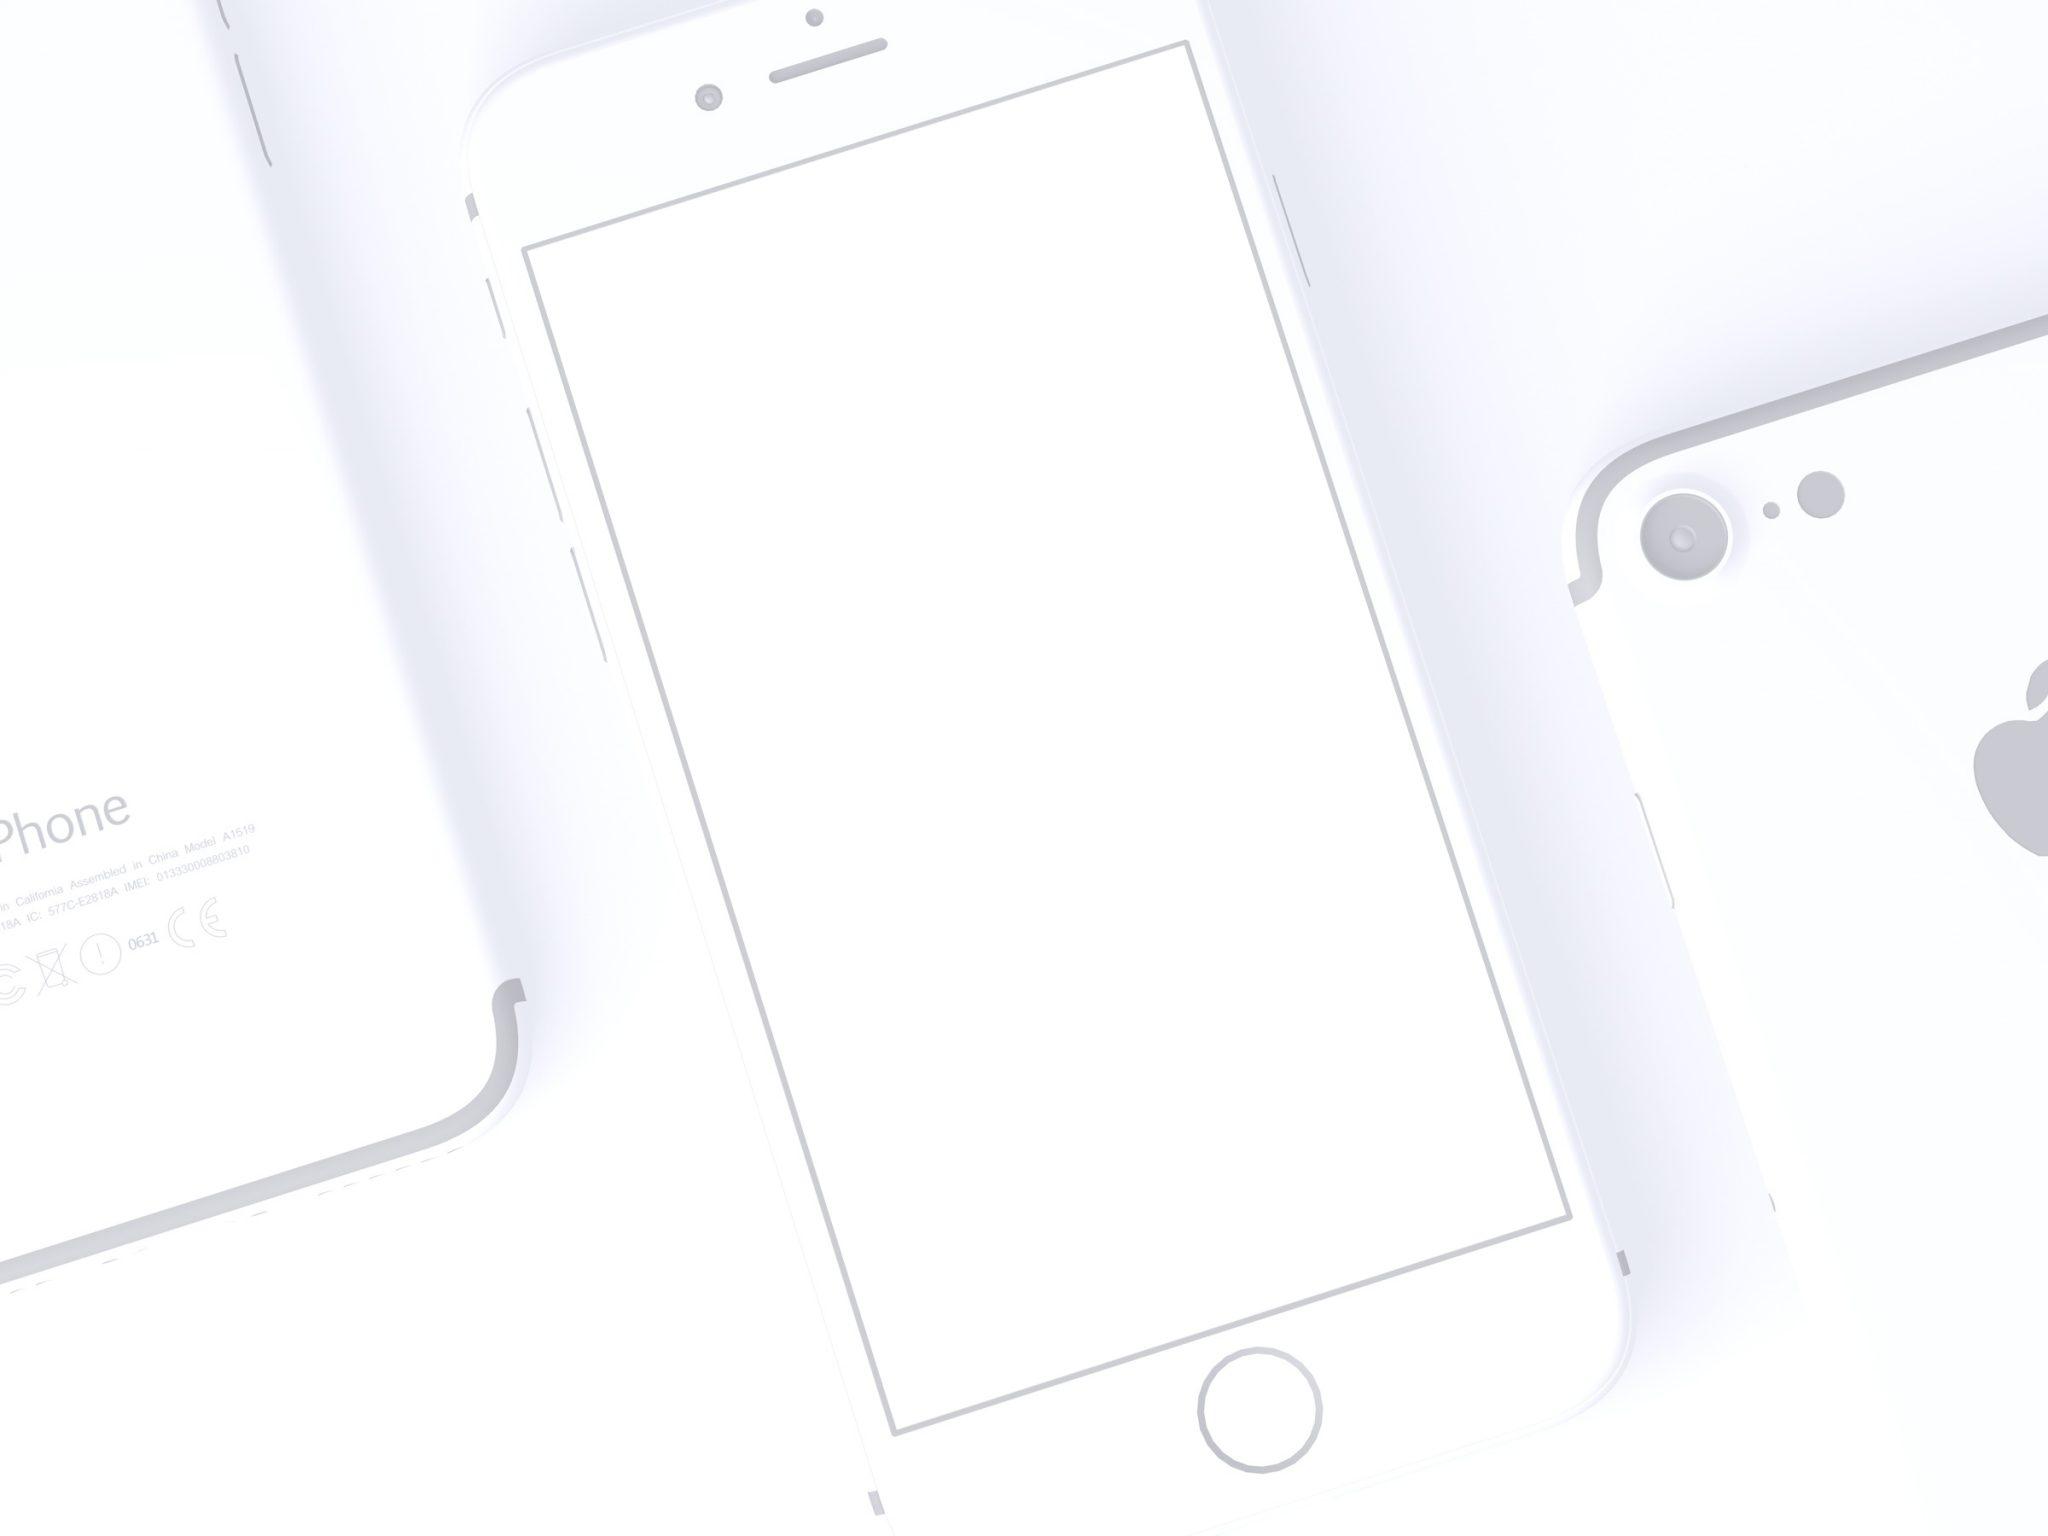 3 Clay Iphone 7 Mockups